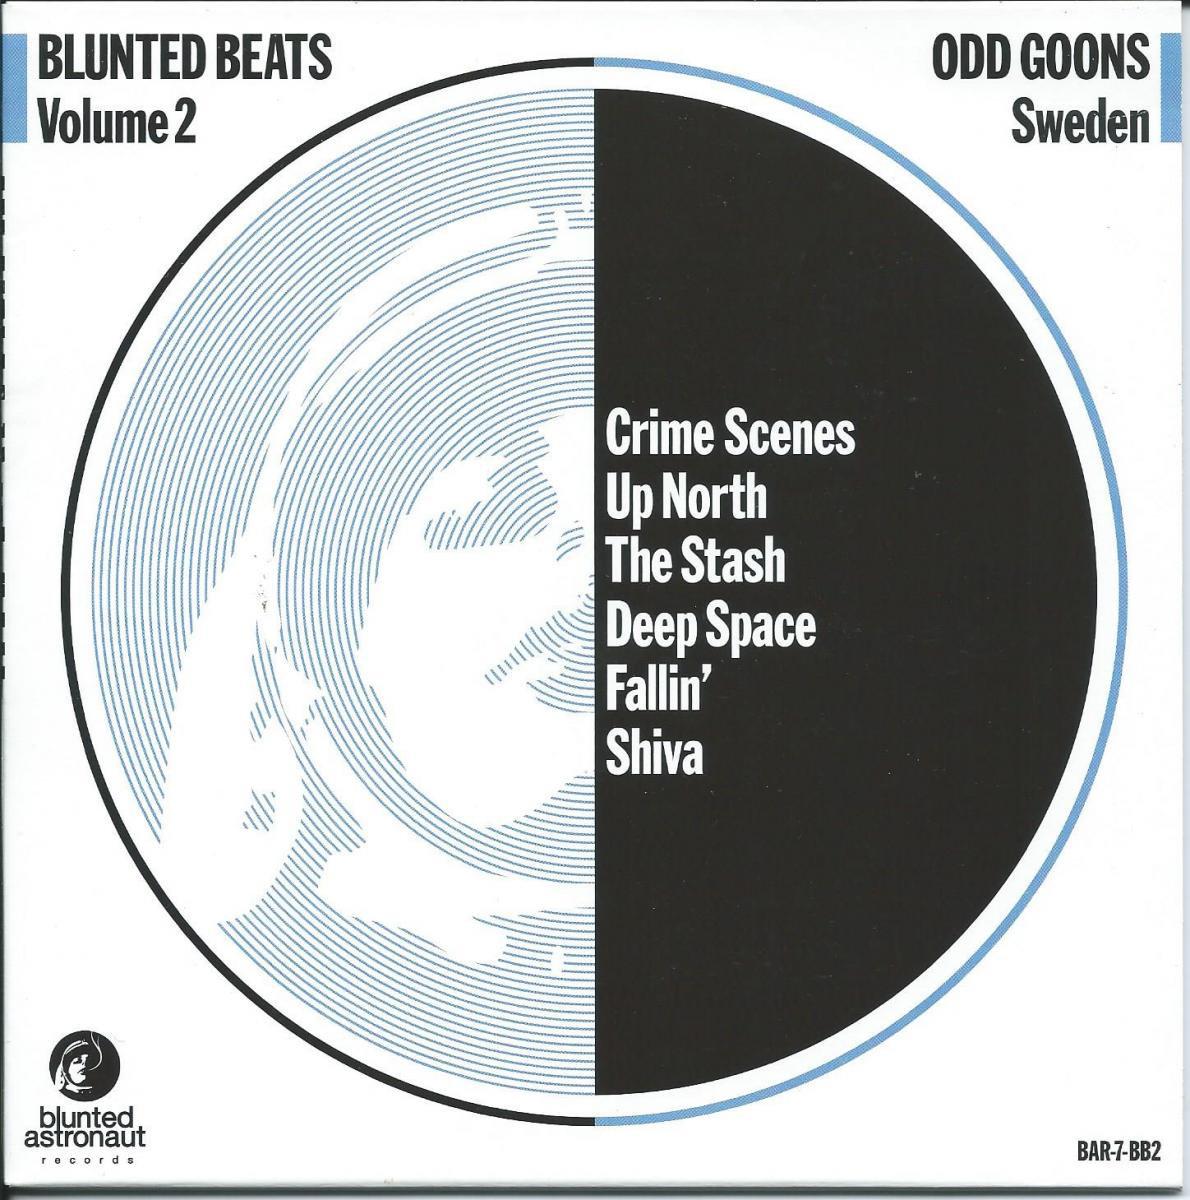 ODD GOONS / BLUNTED BEATS VOL.2 (6TRACKS EP) (7